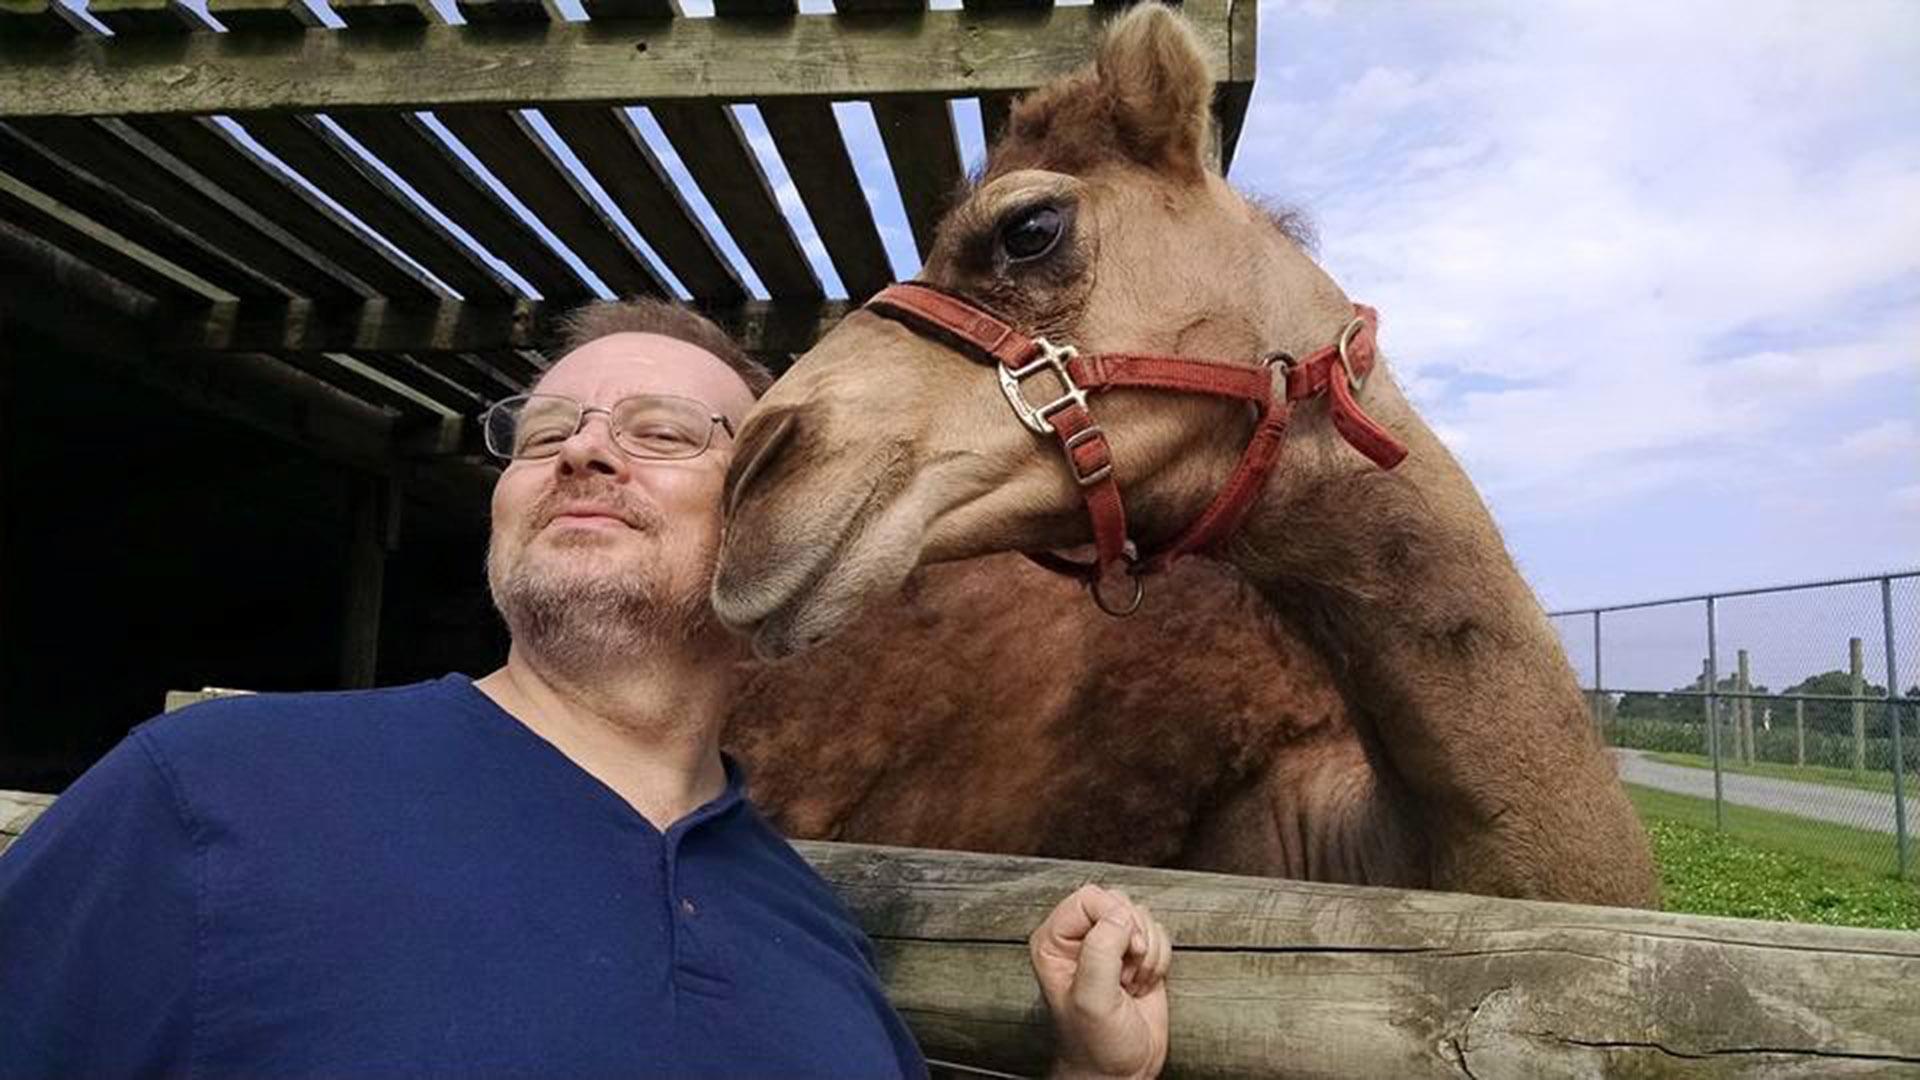 Close encounter with a camel at Lake Tobias Wildlife Park